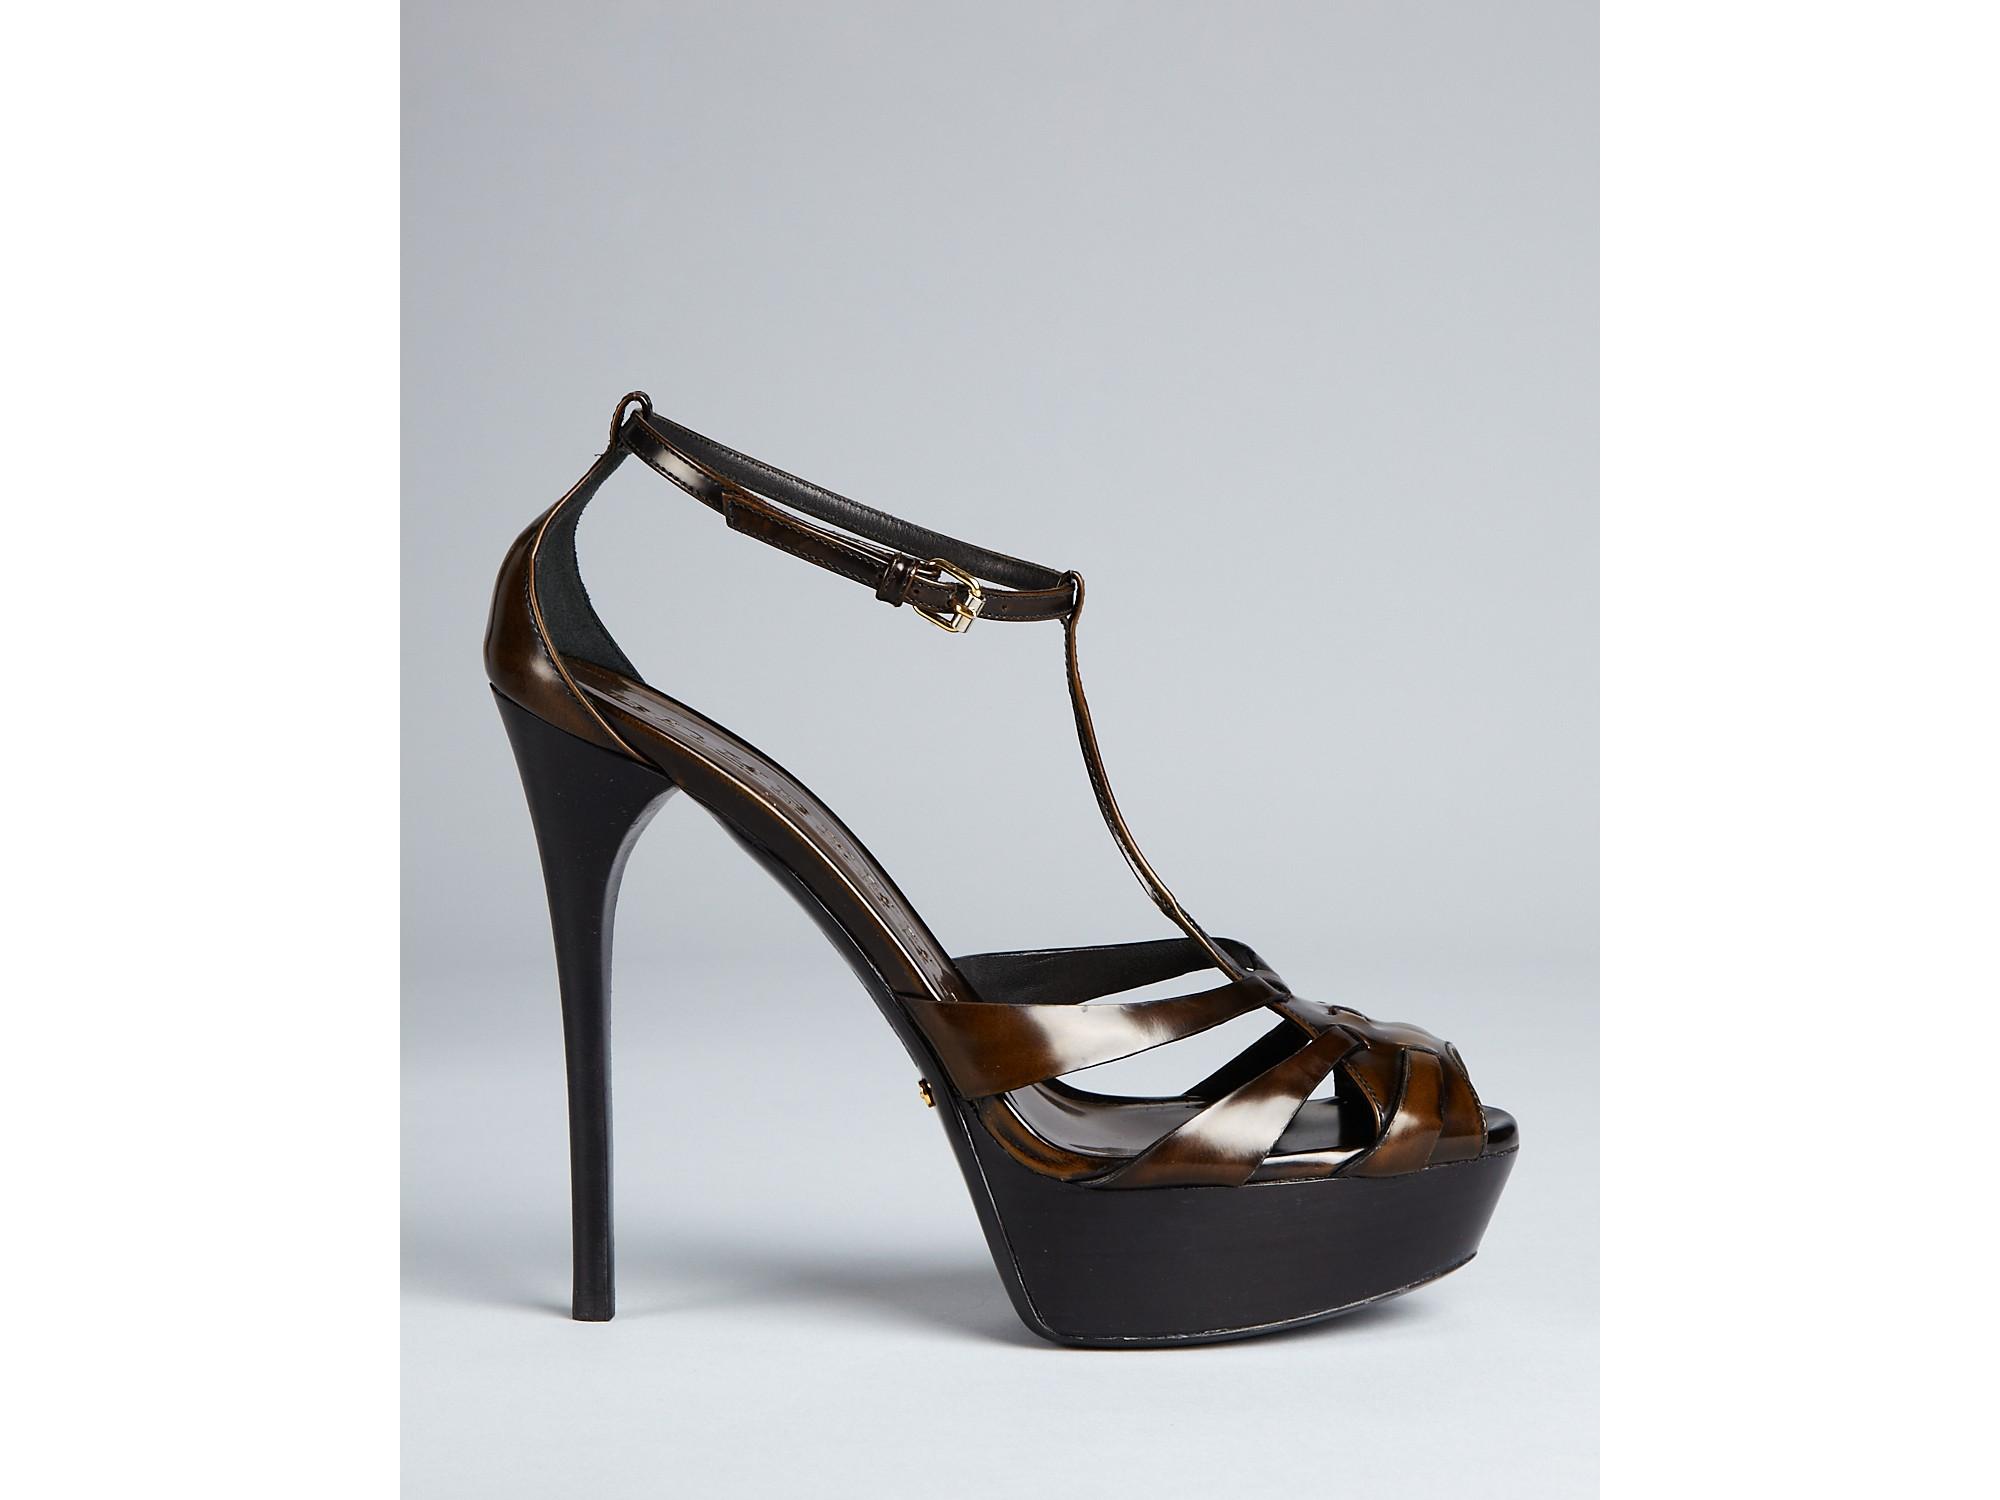 Burberry Platform T-Strap Sandals buy cheap 2014 unisex footlocker finishline online buy cheap good selling buy authentic online nTHCFAd5Ie